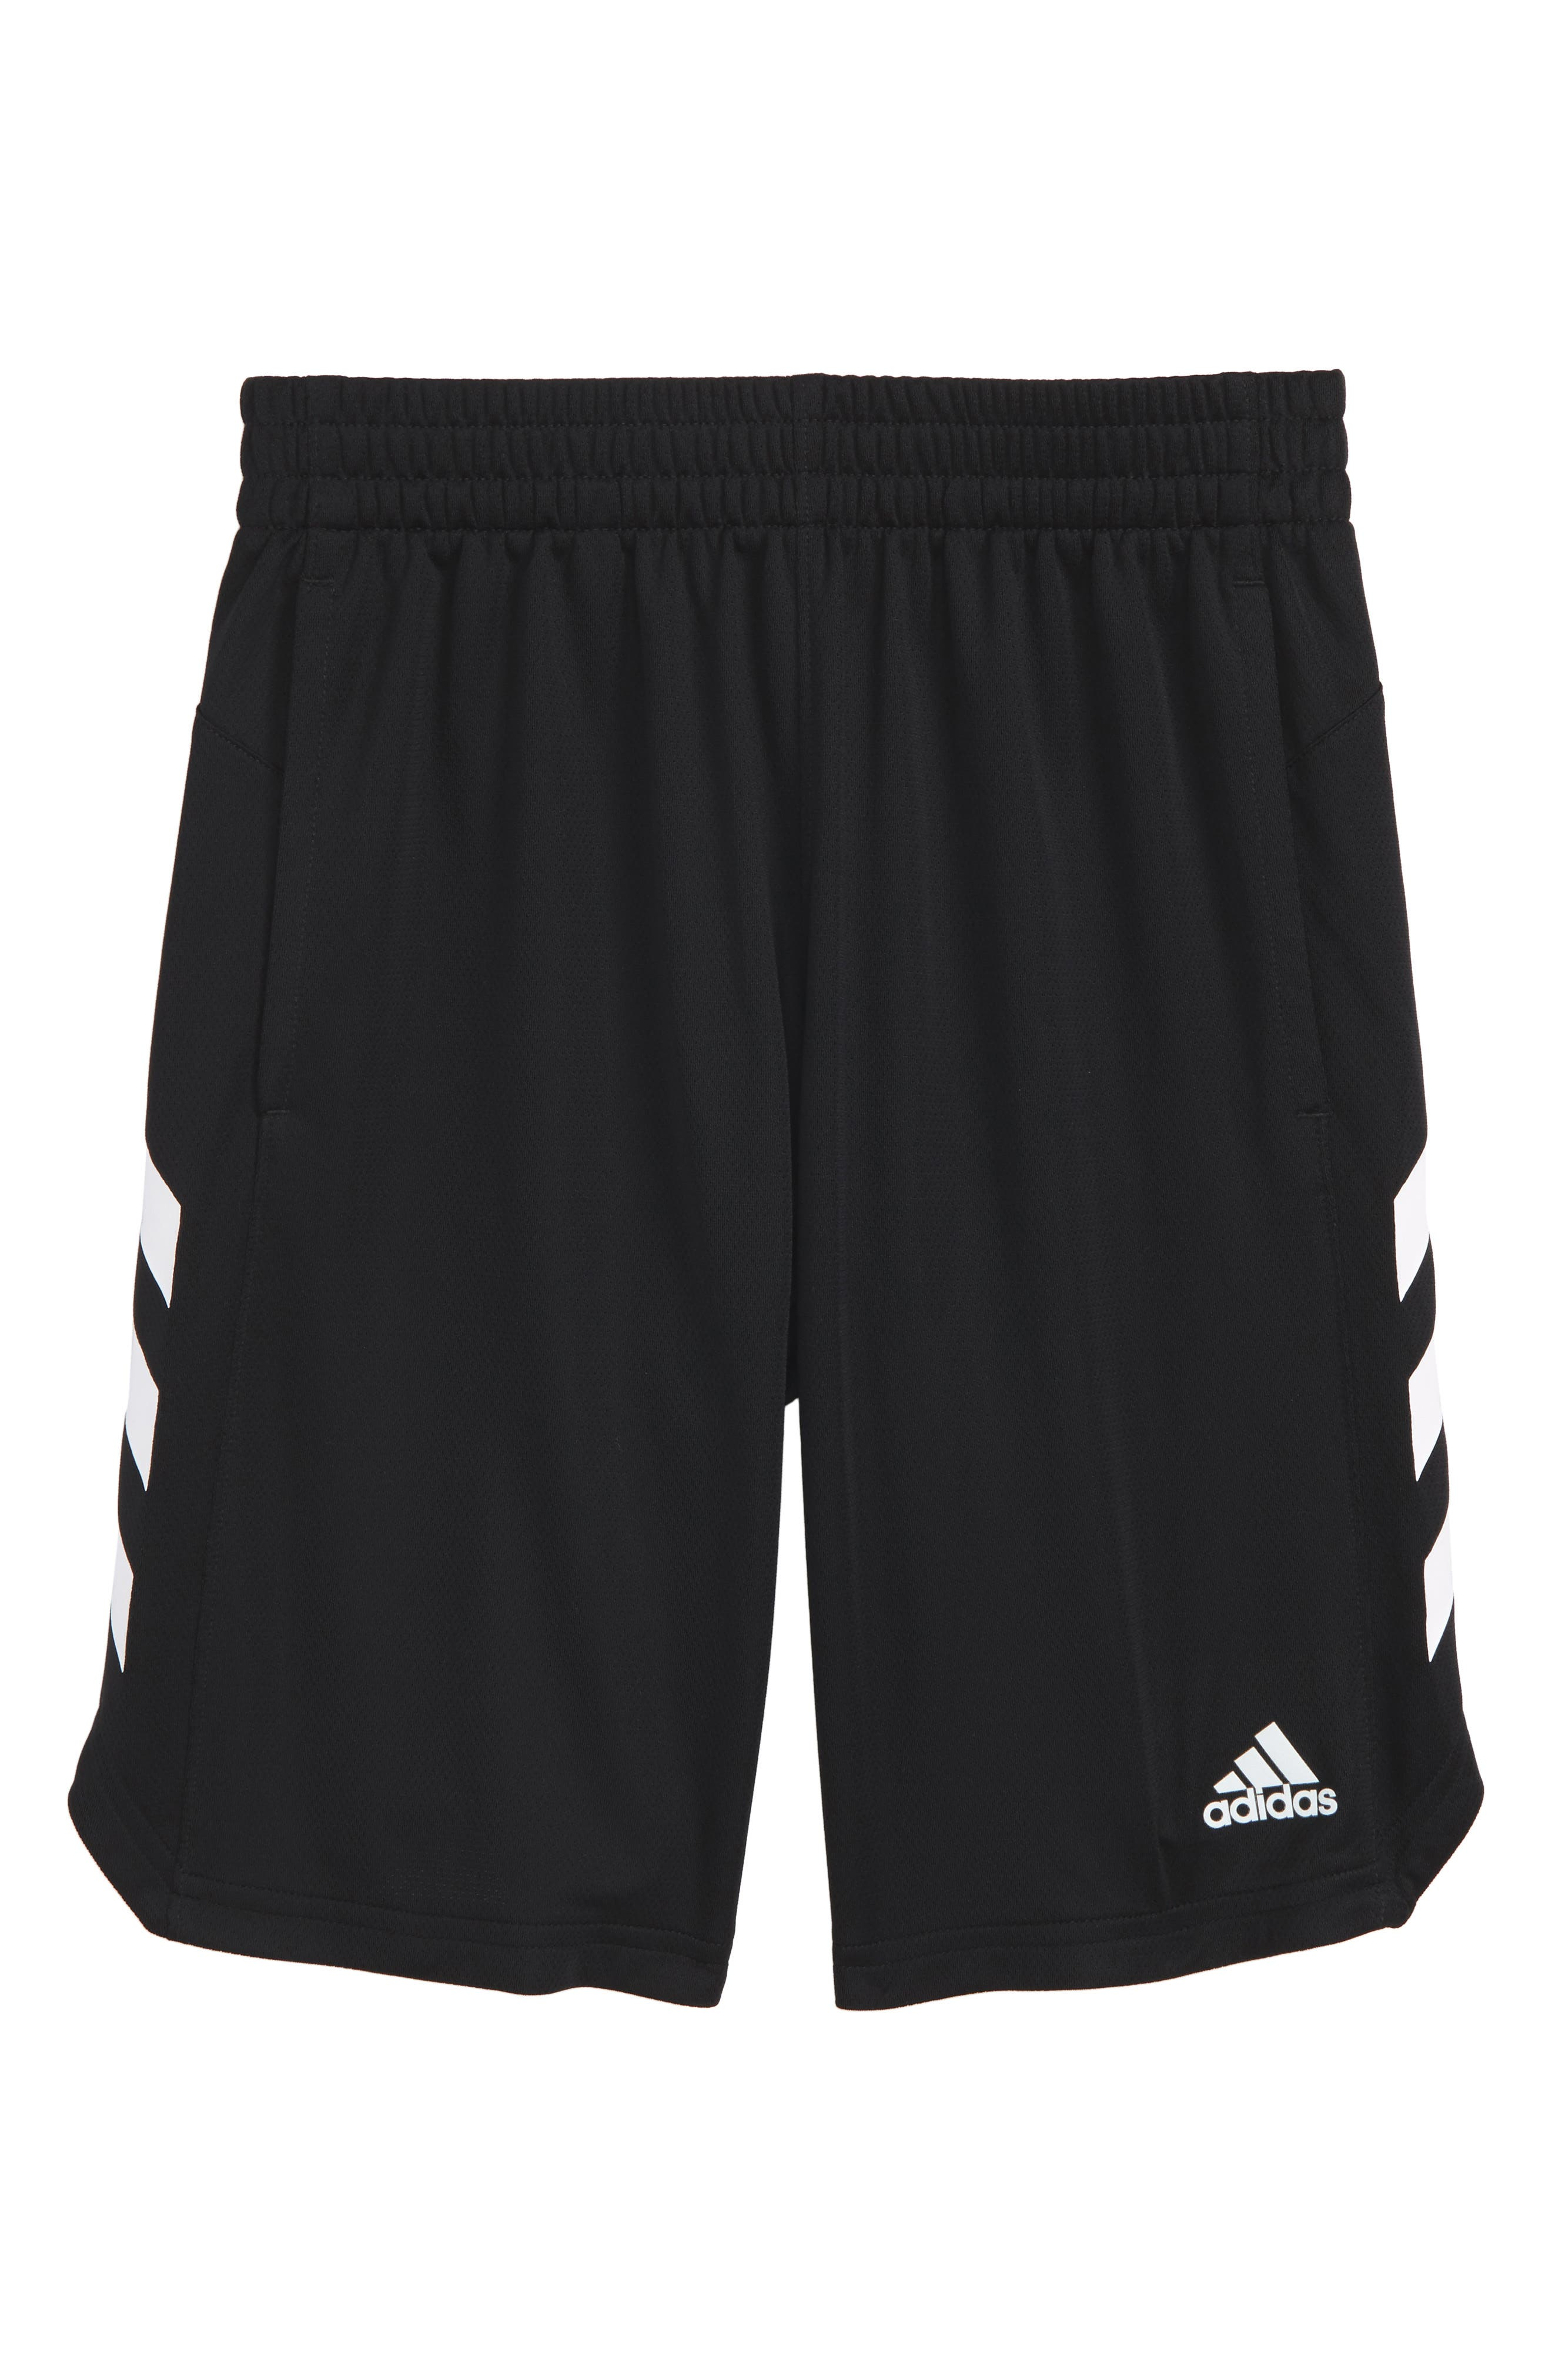 Climacool<sup>®</sup> Sport Shorts,                             Main thumbnail 1, color,                             001